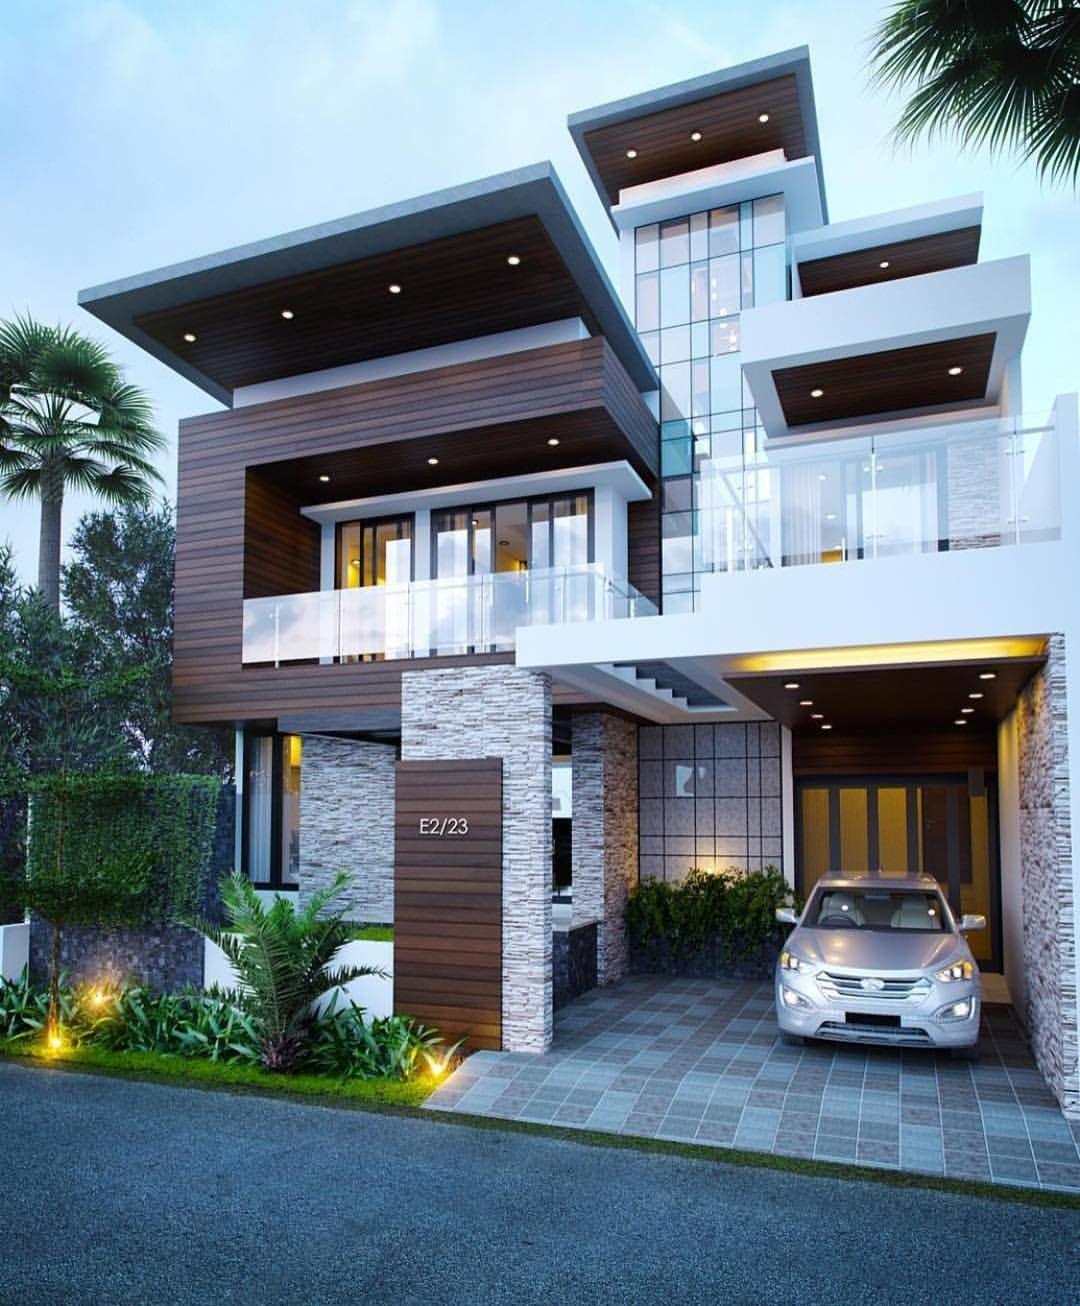 Kallistos Stelios Karalis Luxury Connoisseur Minimalist House Design Facade House Architecture House